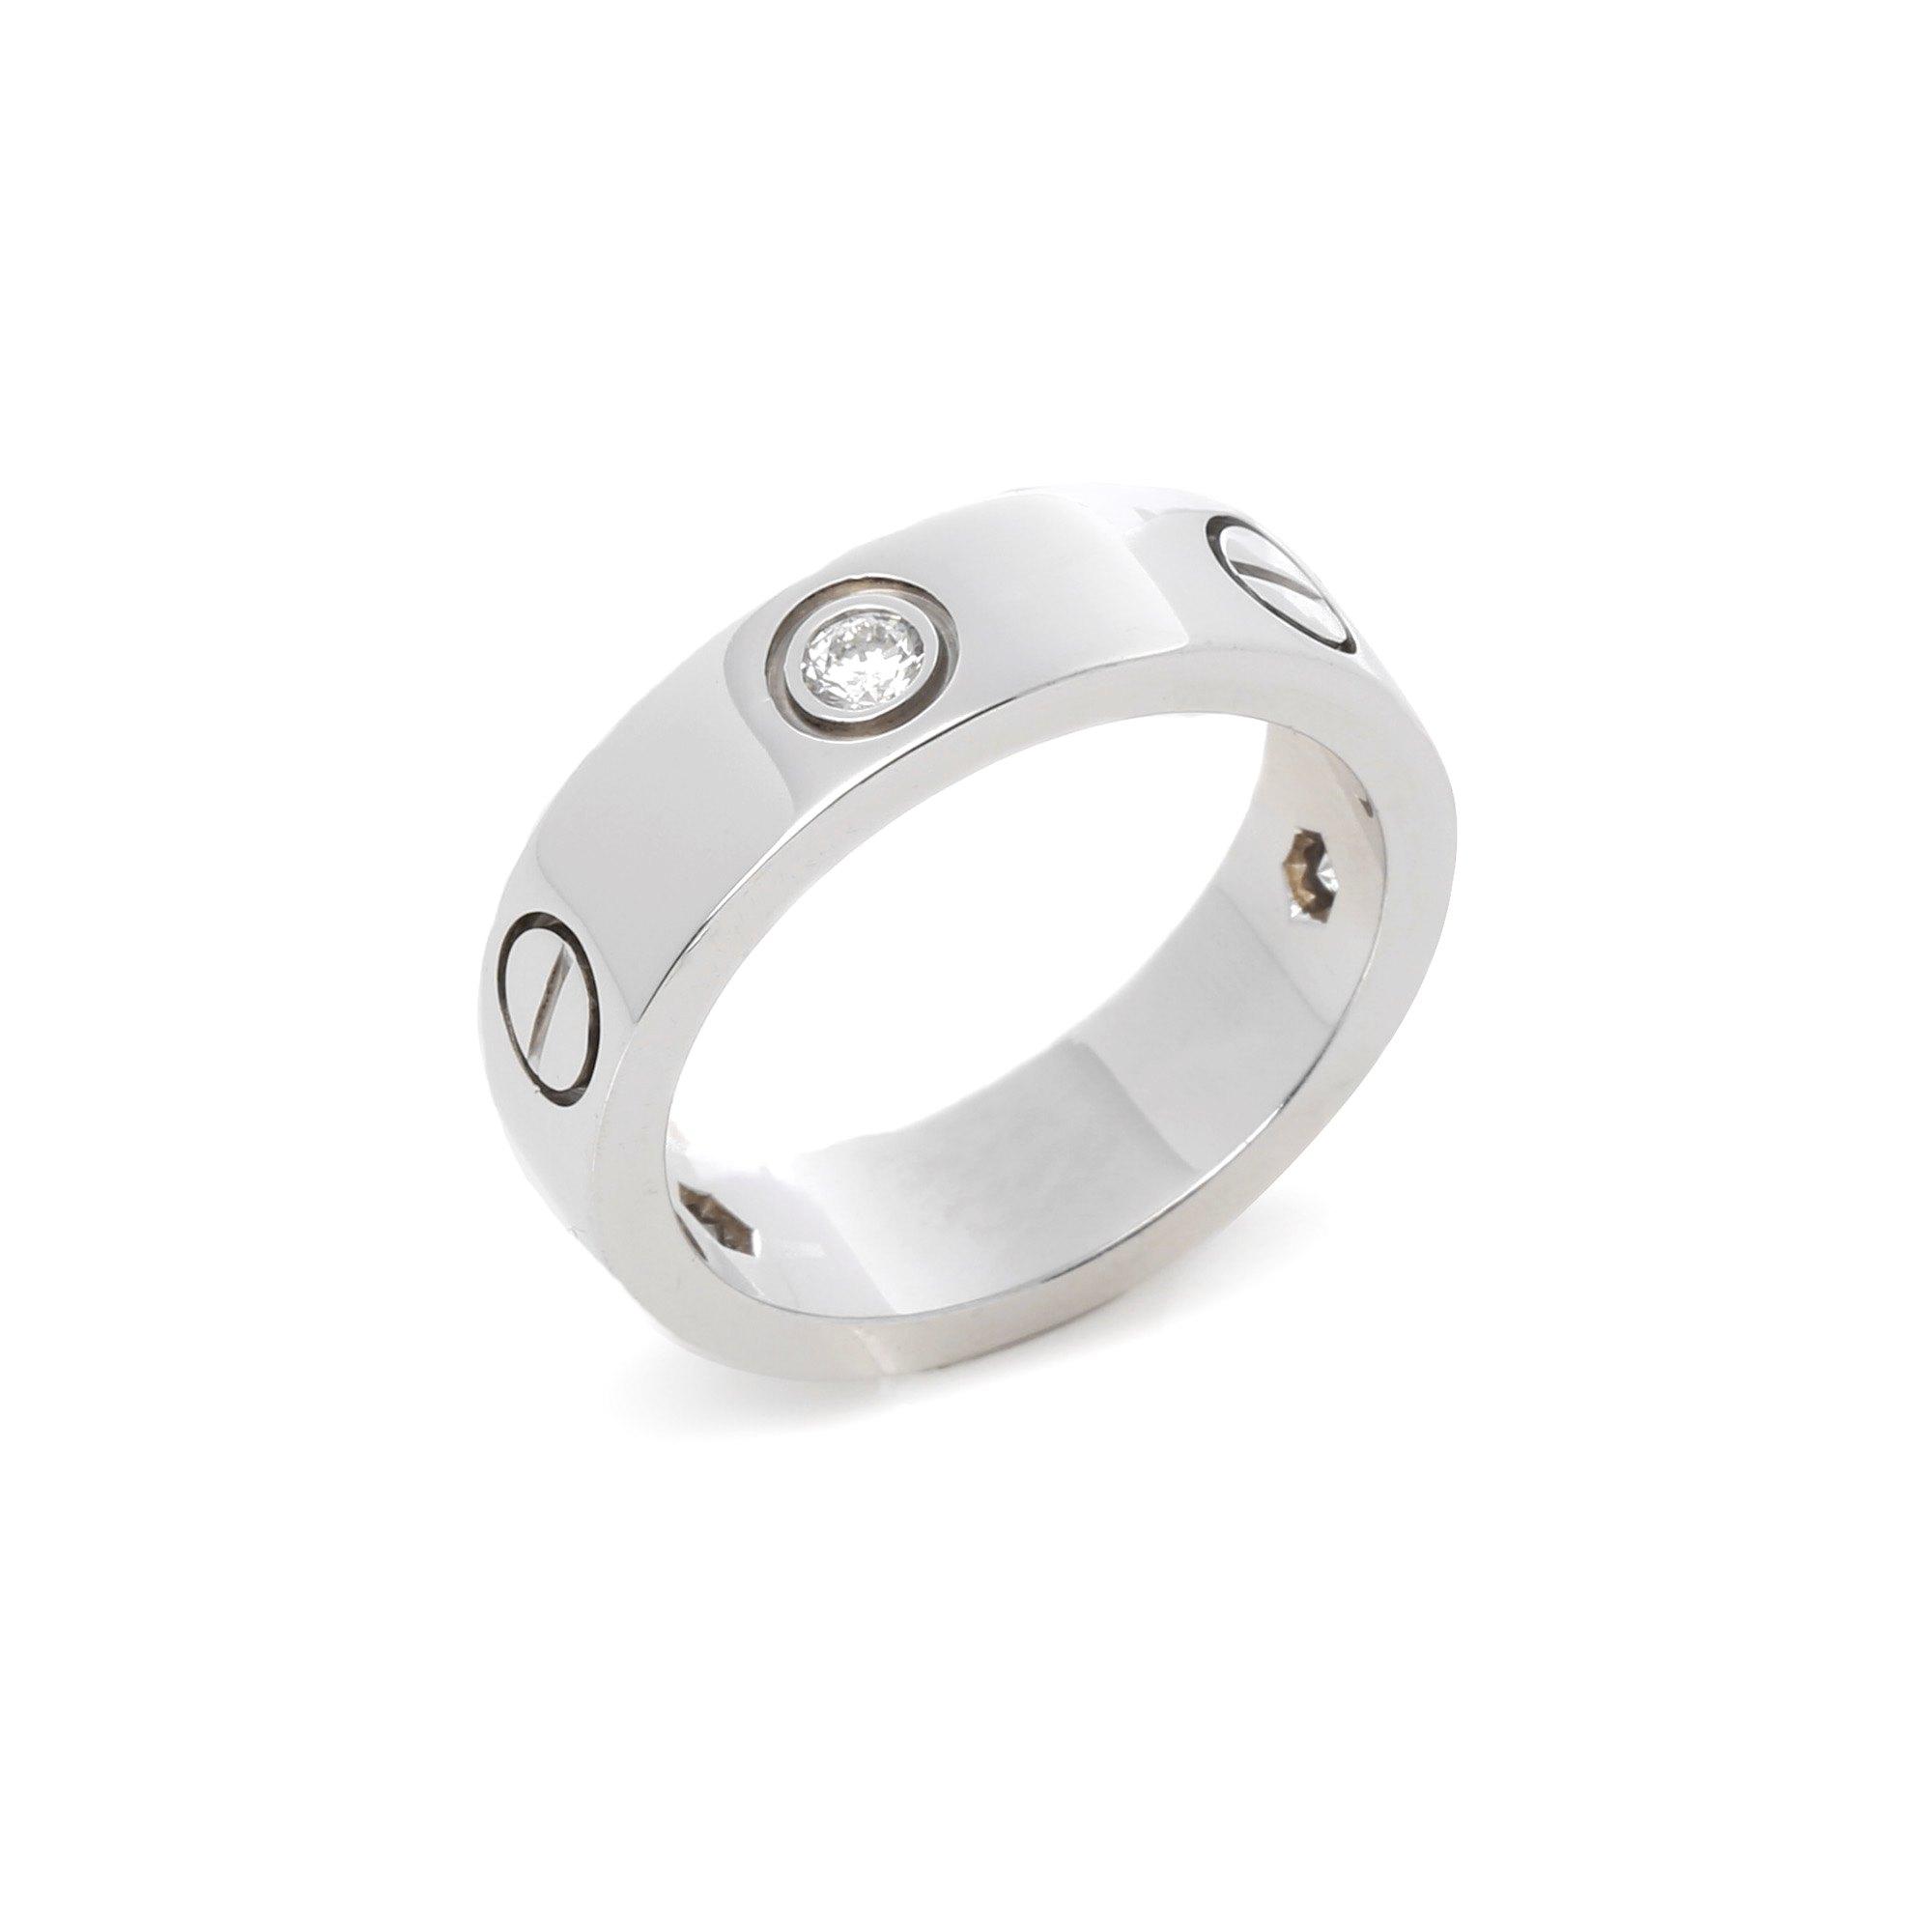 Cartier Love 18ct White Gold 3 Diamond Ring